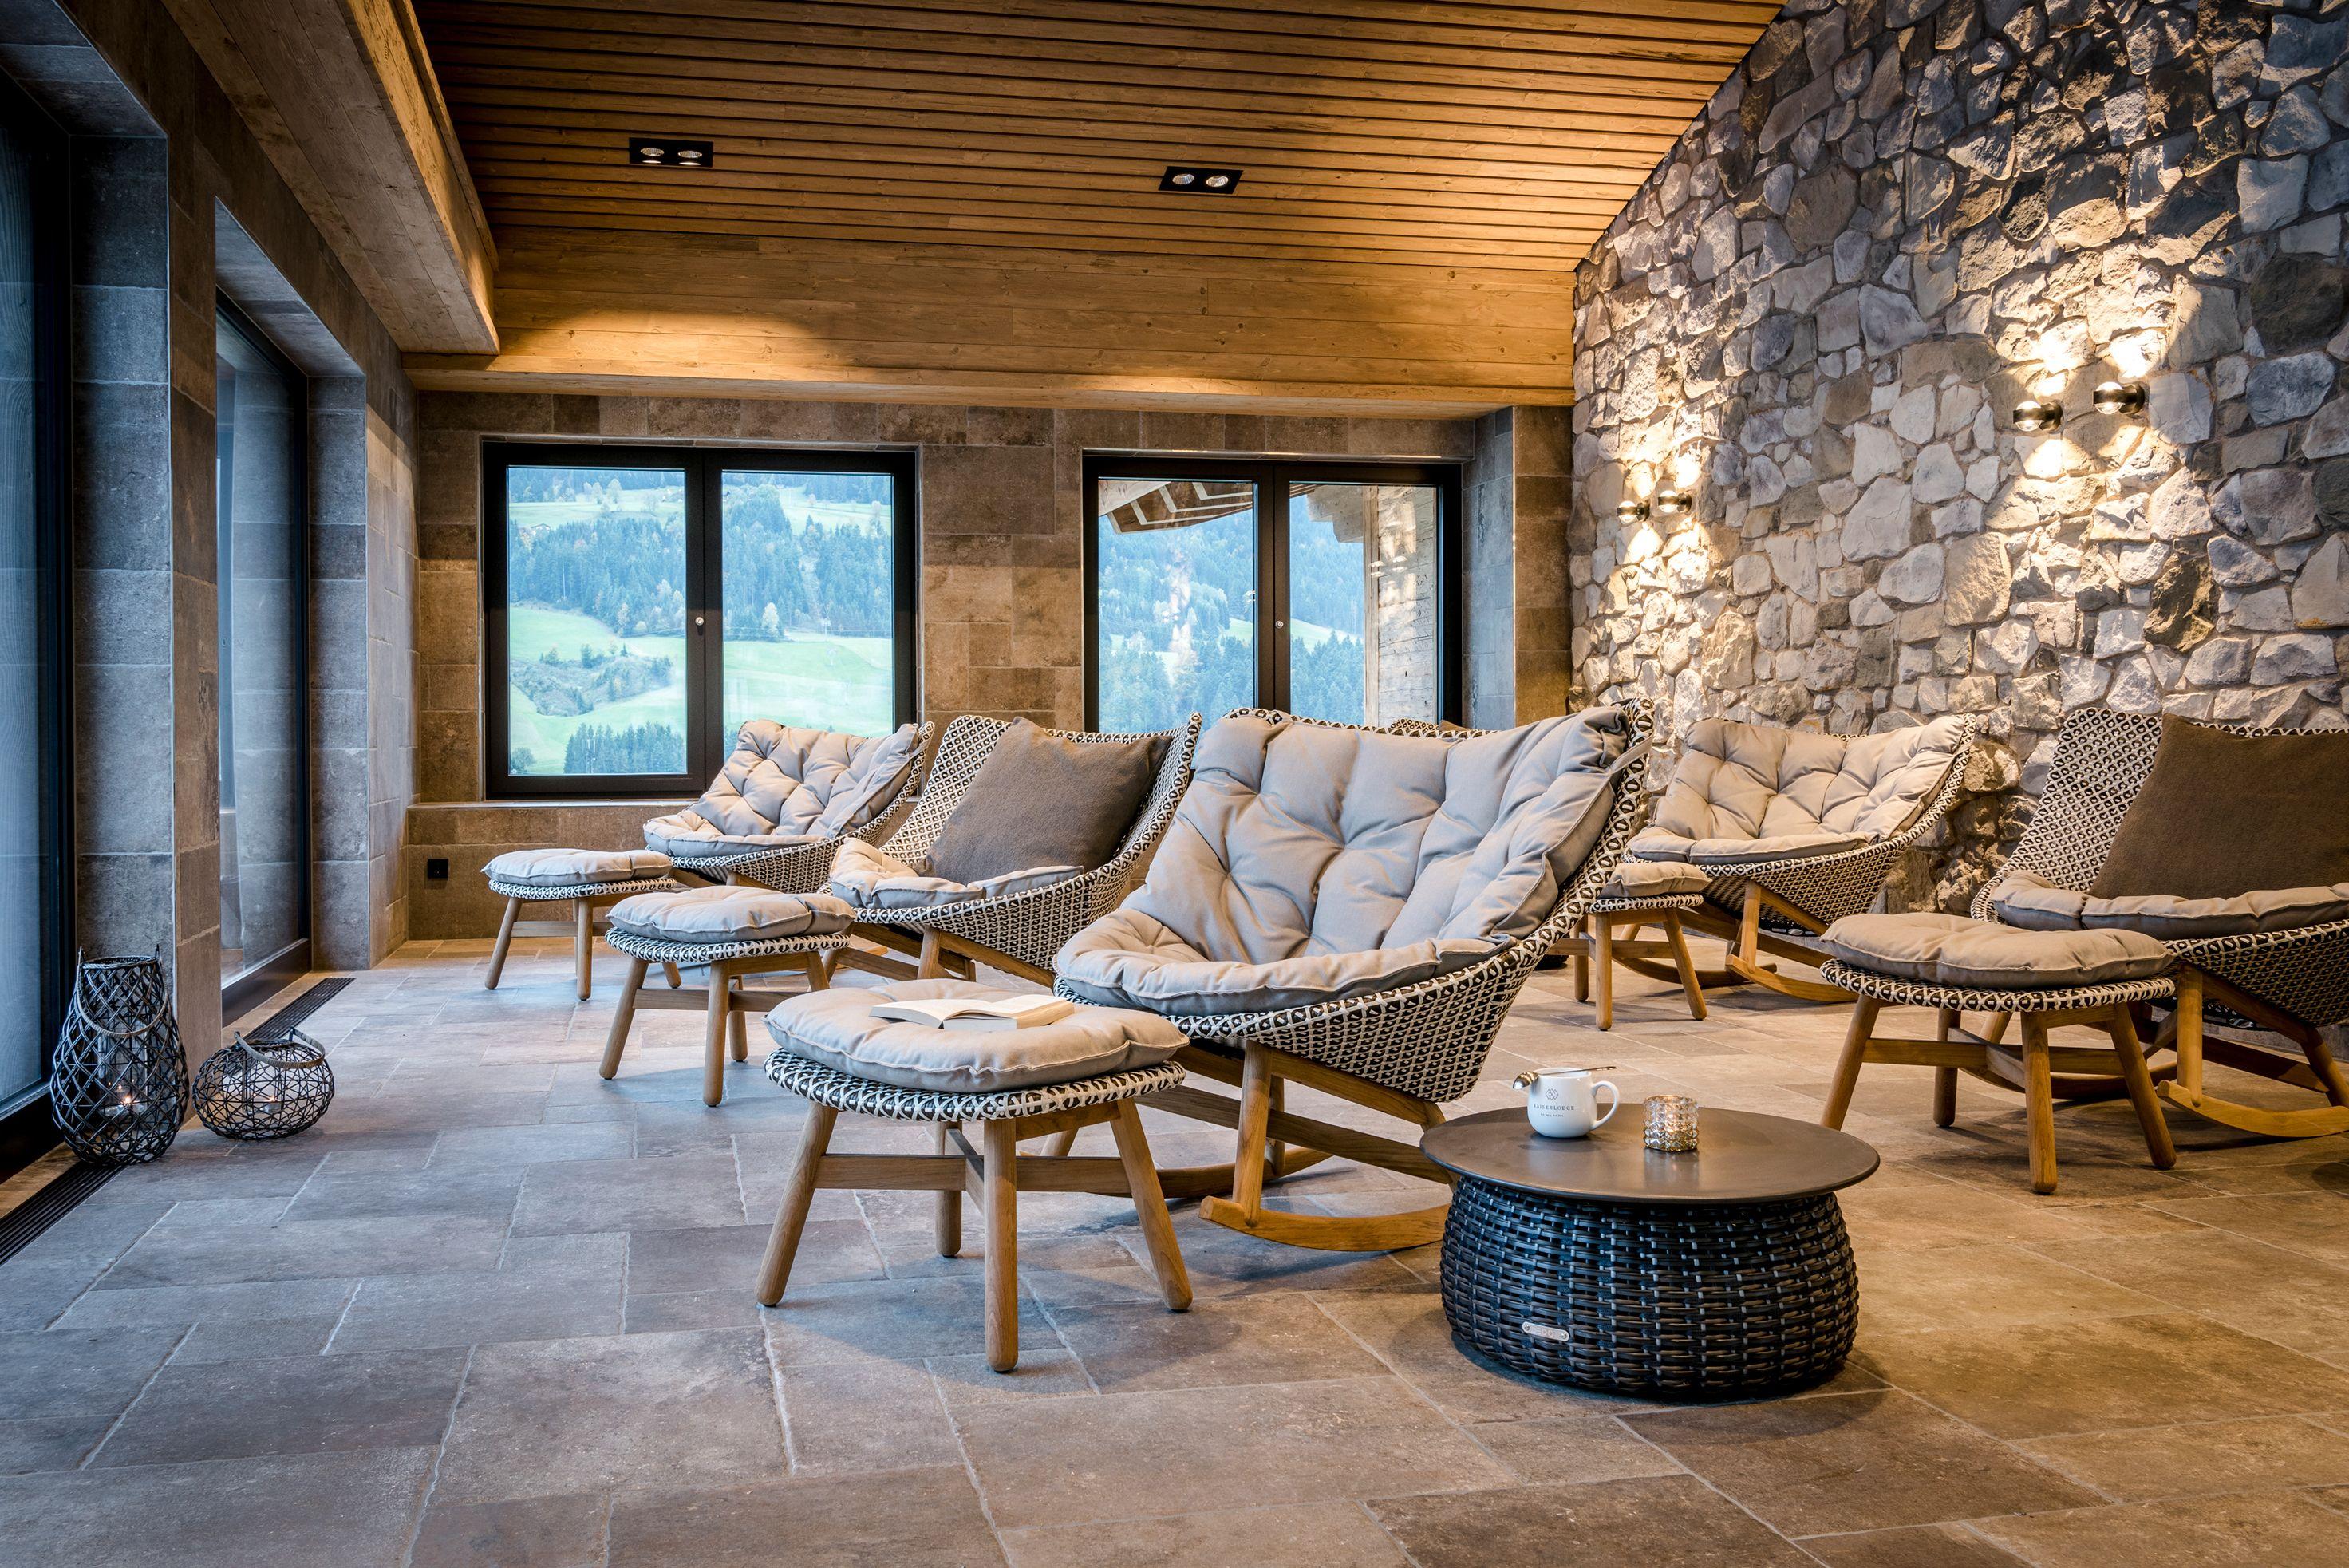 Kaiserlodge Am Berg Am See Seelig Spa Wellness Spa Pool Entspannung Dedon Erholung Scheffau Tirol Mobeldesign Haus Deko Innenarchitektur